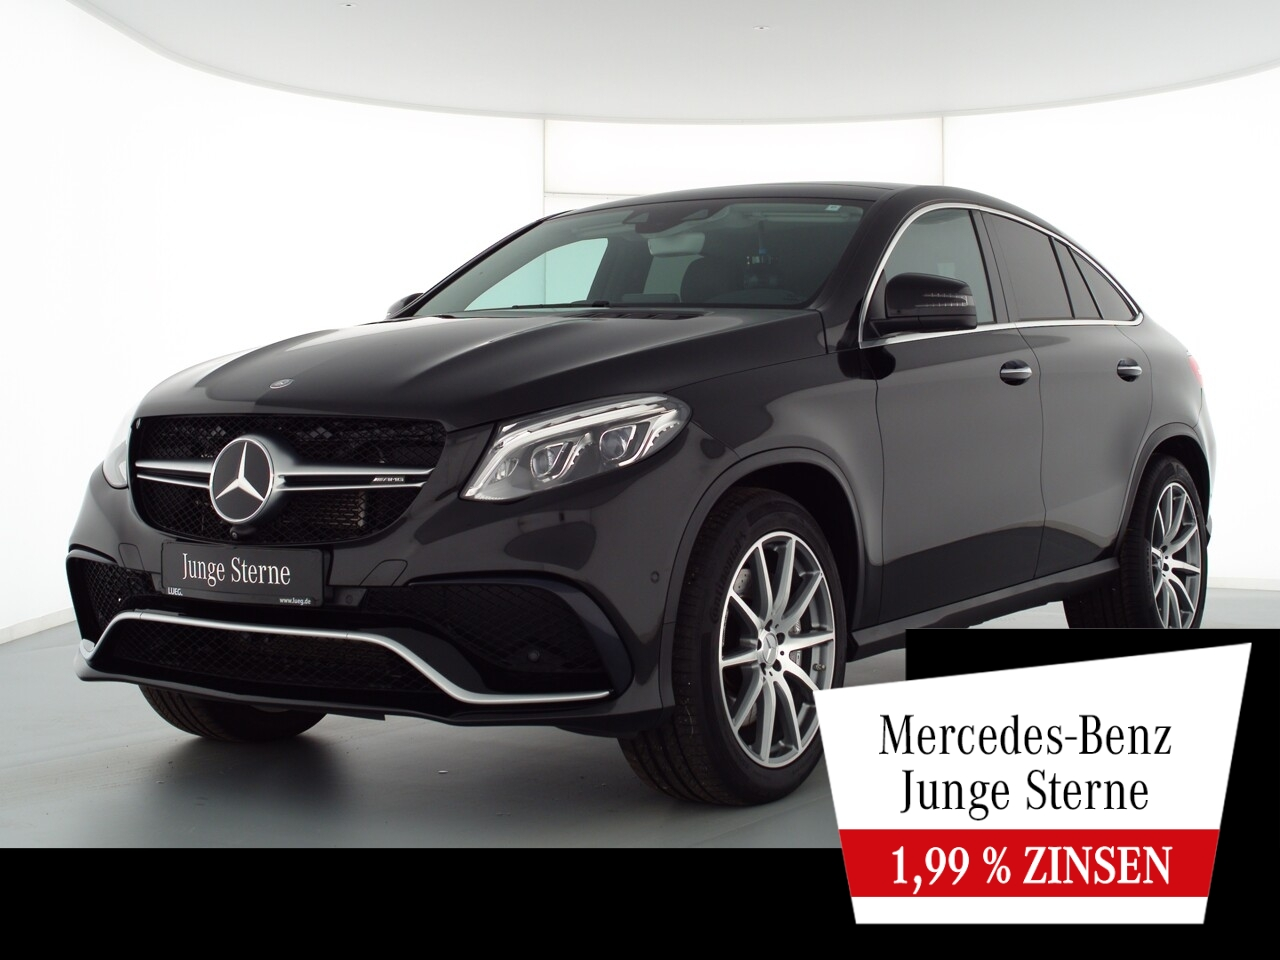 Mercedes-Benz GLE 63 AMG 4M Coupe COM+Pano+LED+Sthzg+DistrP+AH, Jahr 2015, Benzin